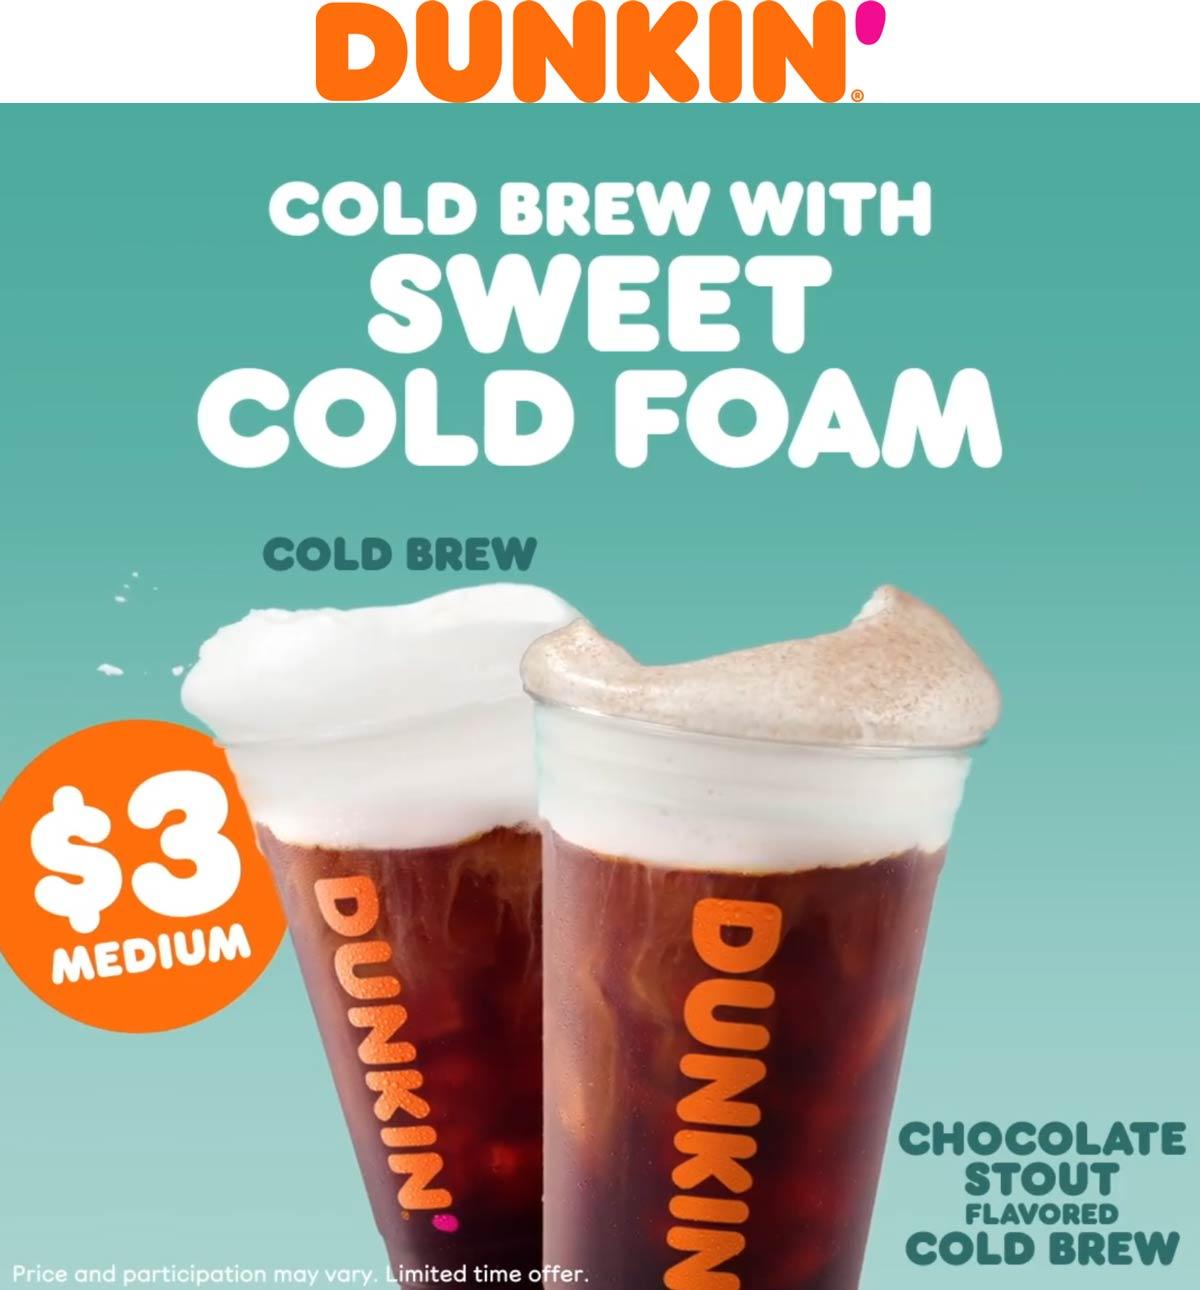 Dunkin Donuts restaurants Coupon  $3 medium cold brew at Dunkin Donuts #dunkindonuts